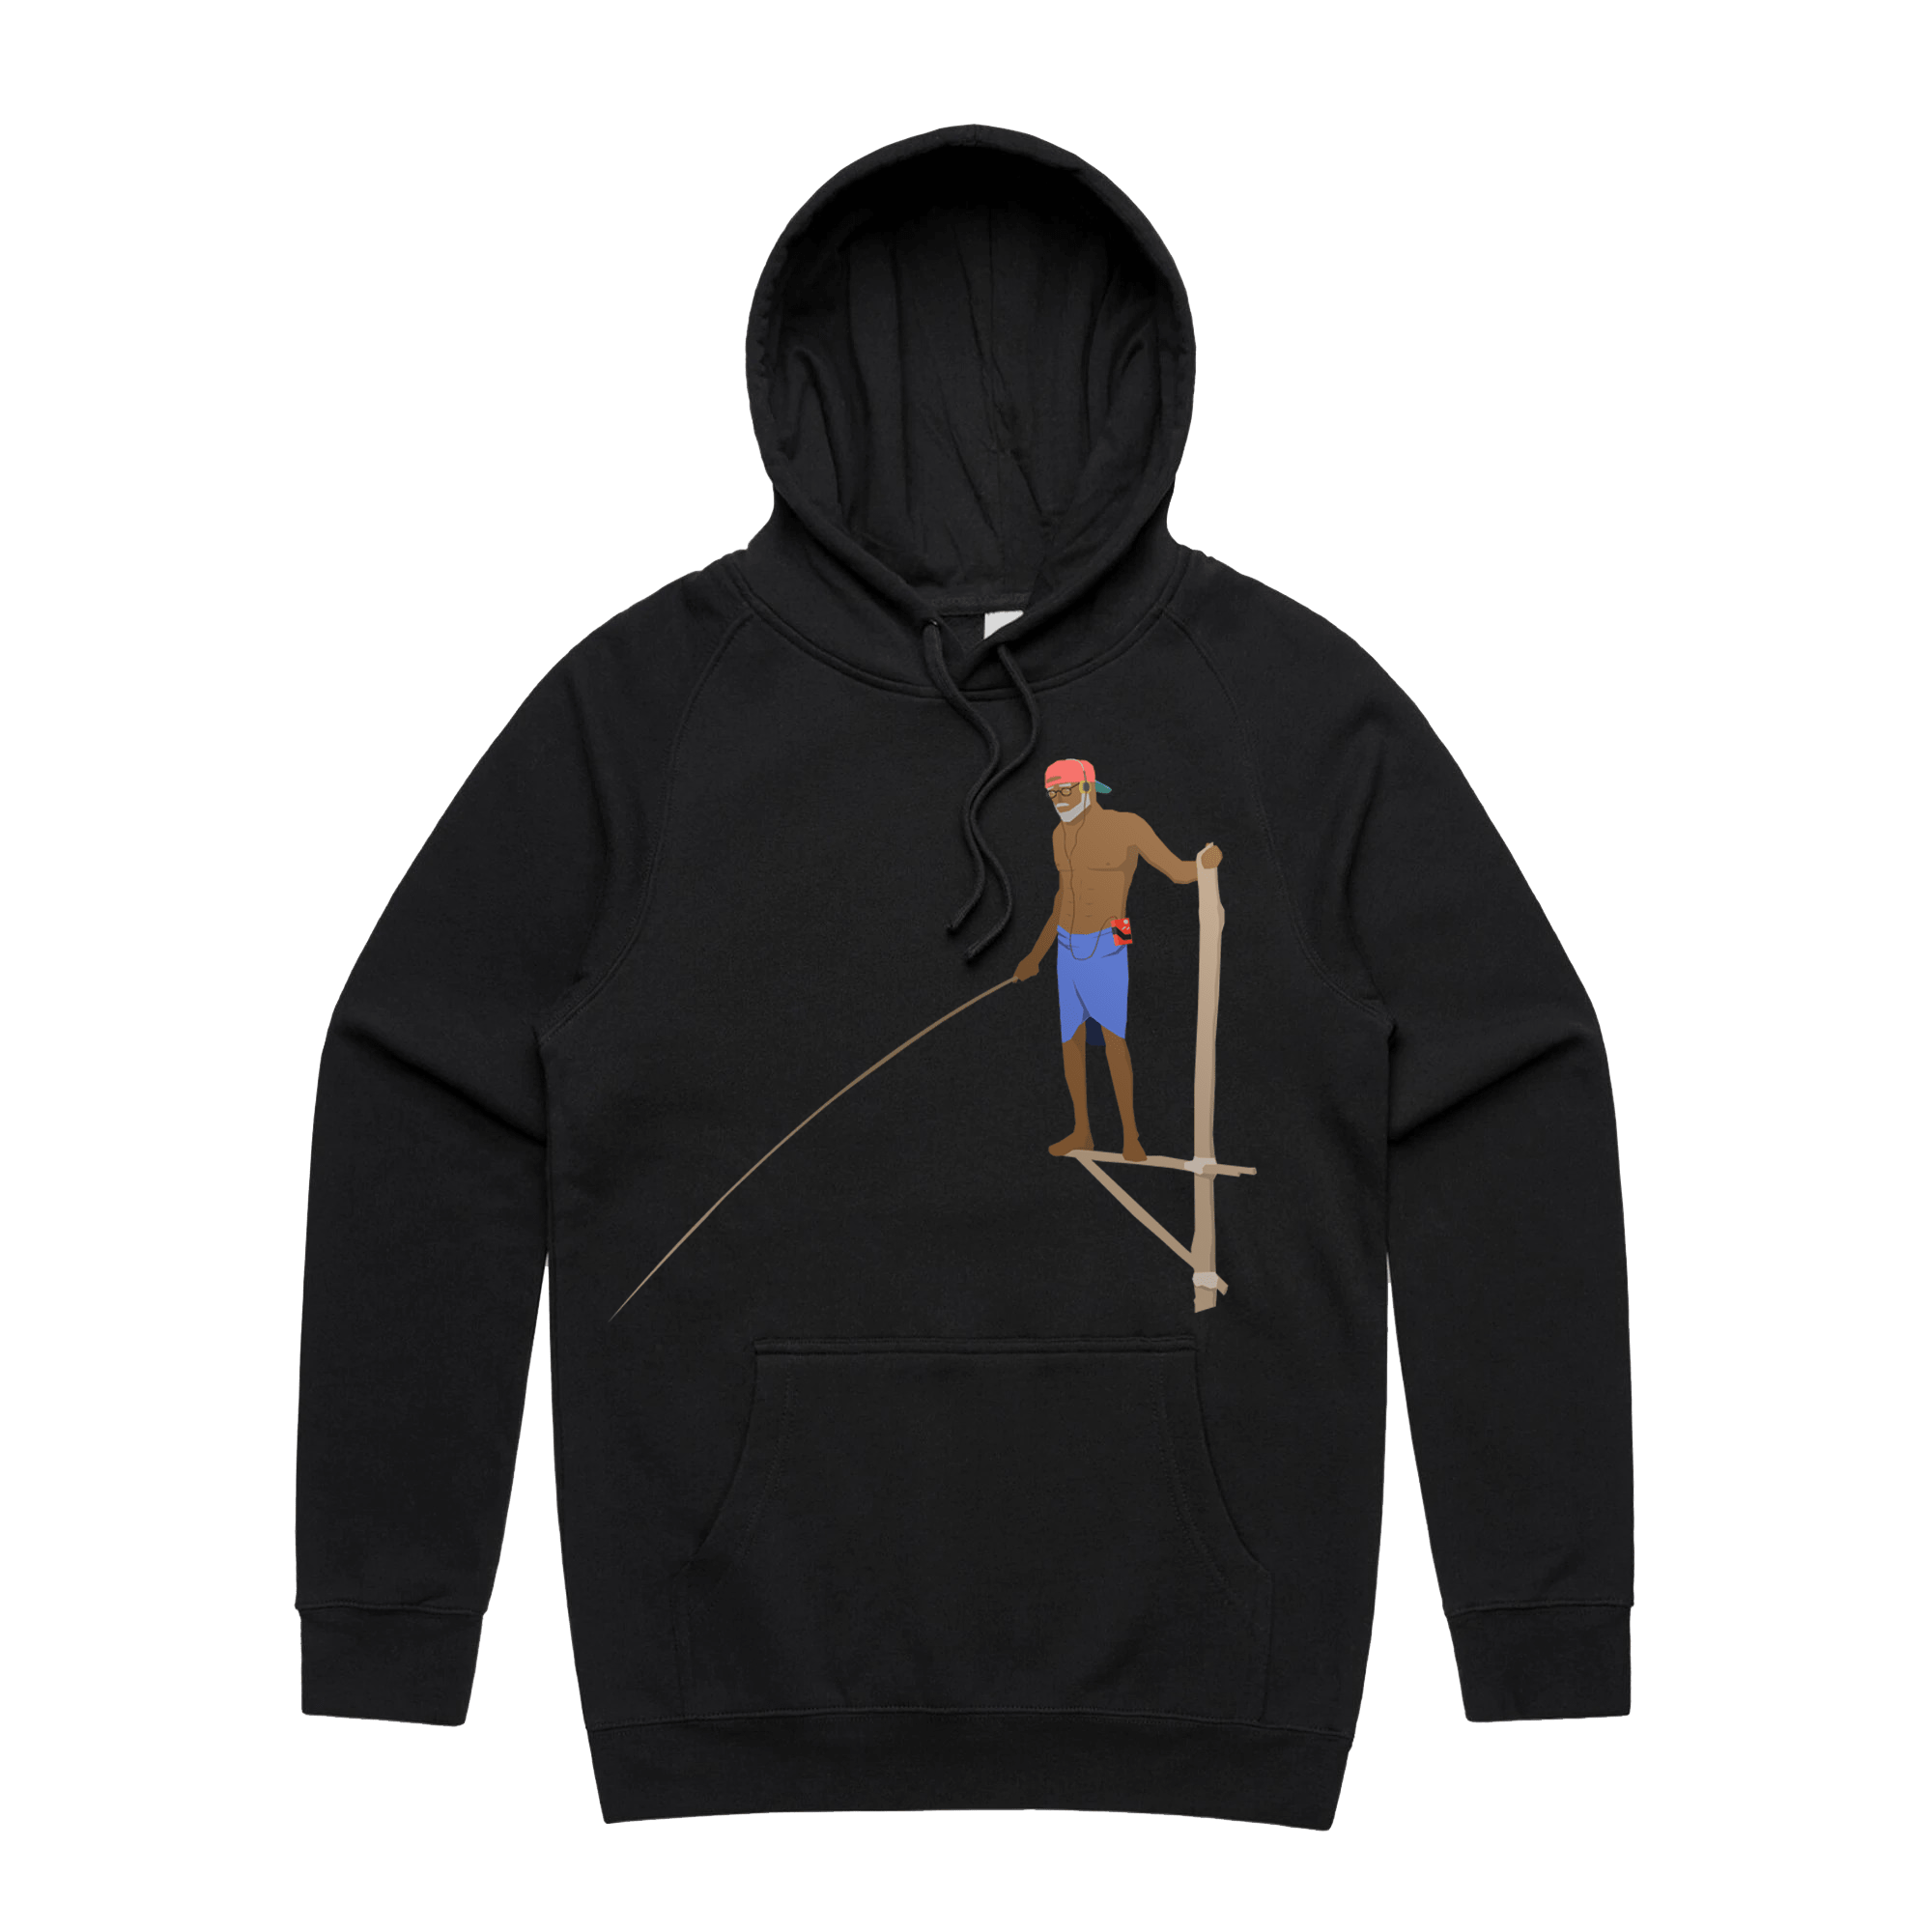 RETRO FISHERMAN Hoodie - BLACK